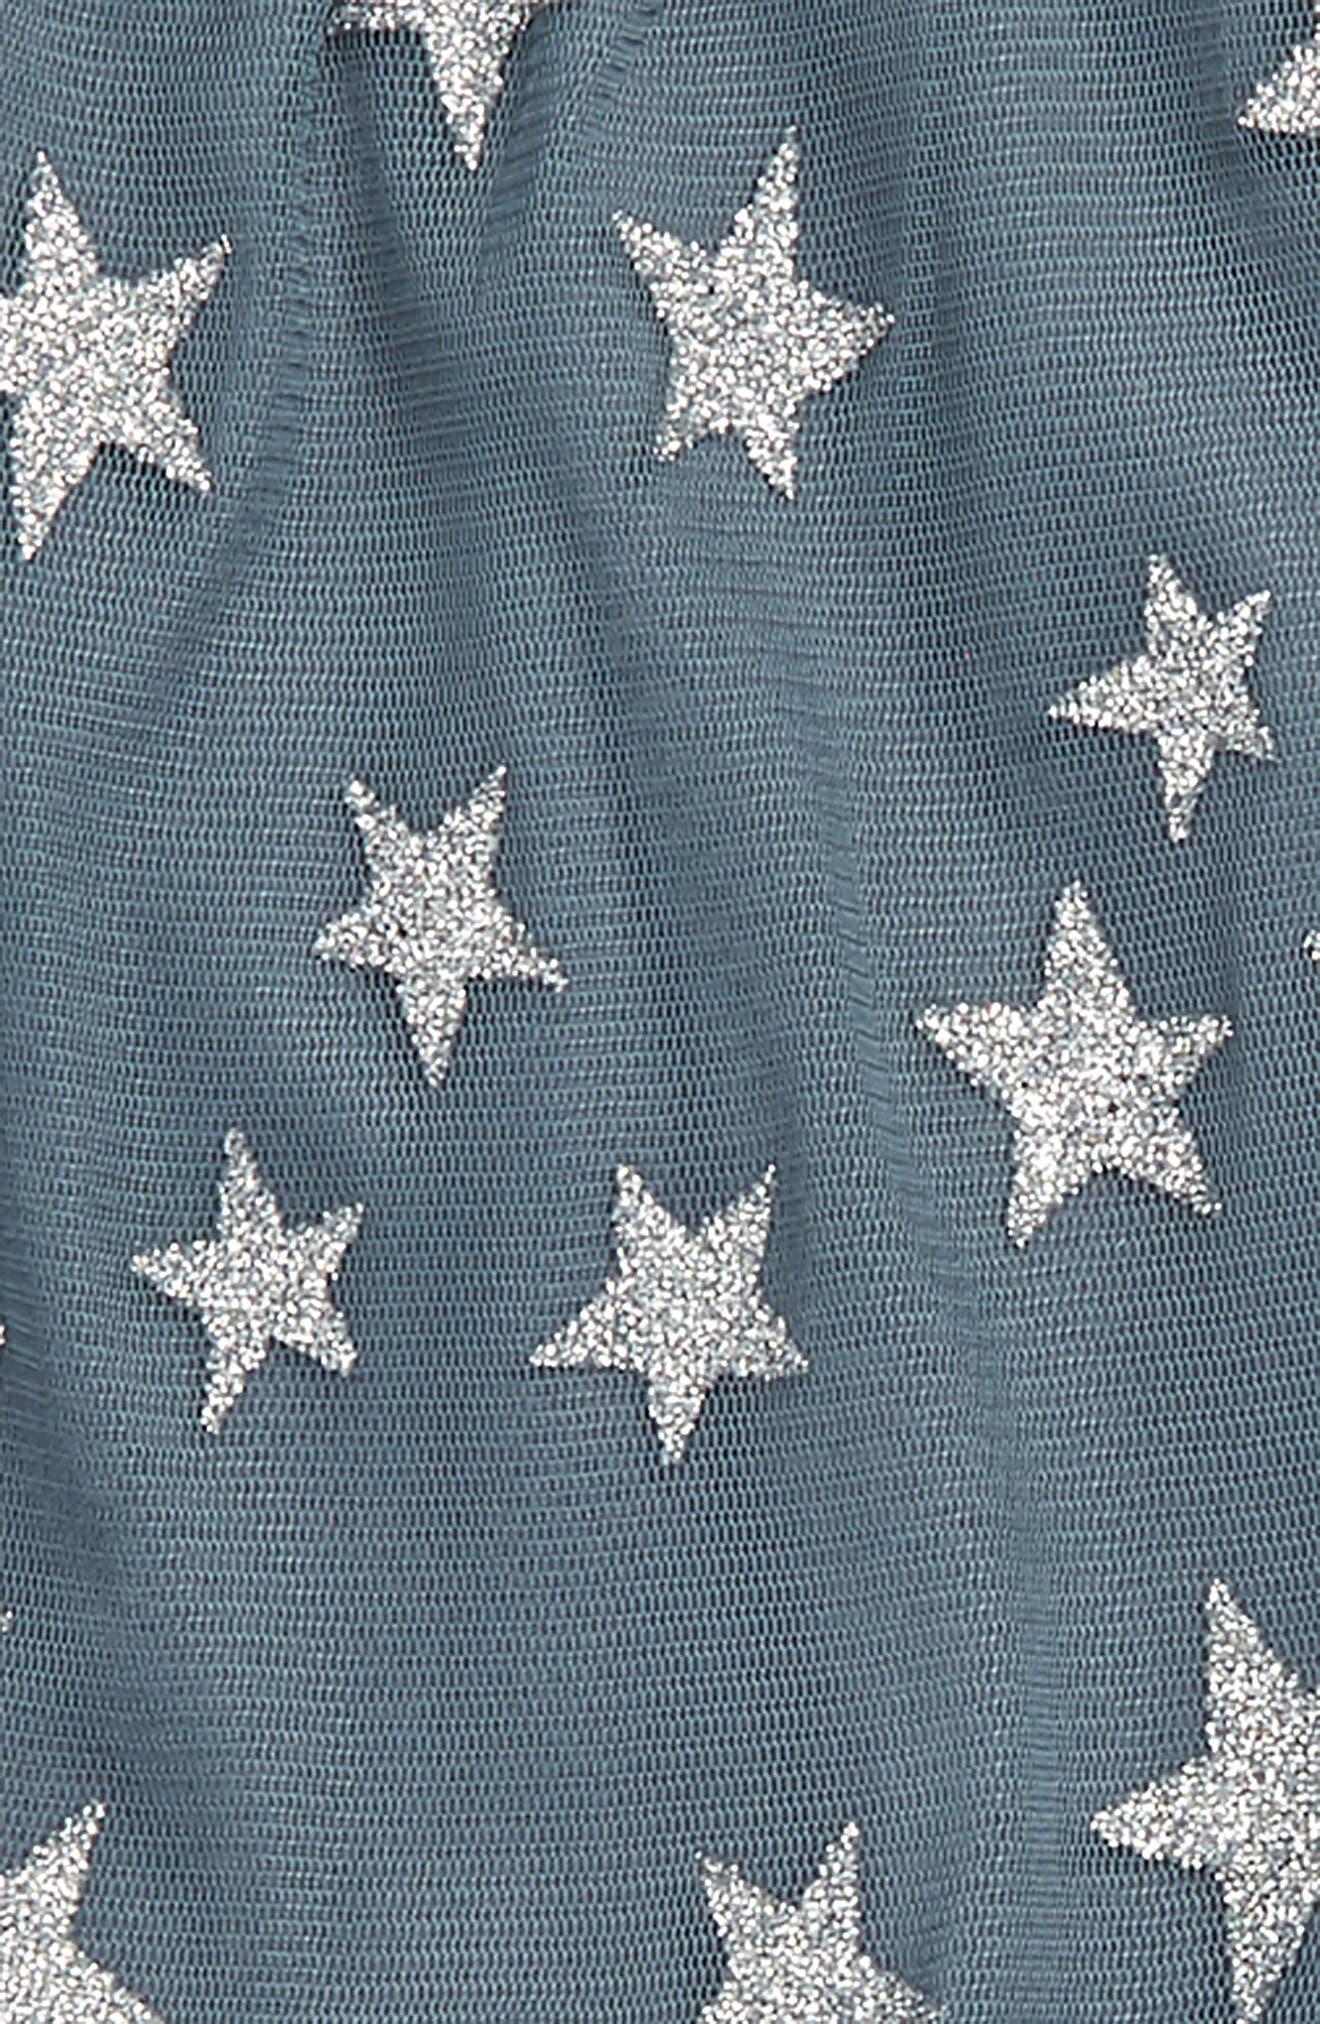 Alternate Image 3  - Stella McCartney Kids Tulle Star Dress (Baby Girls)